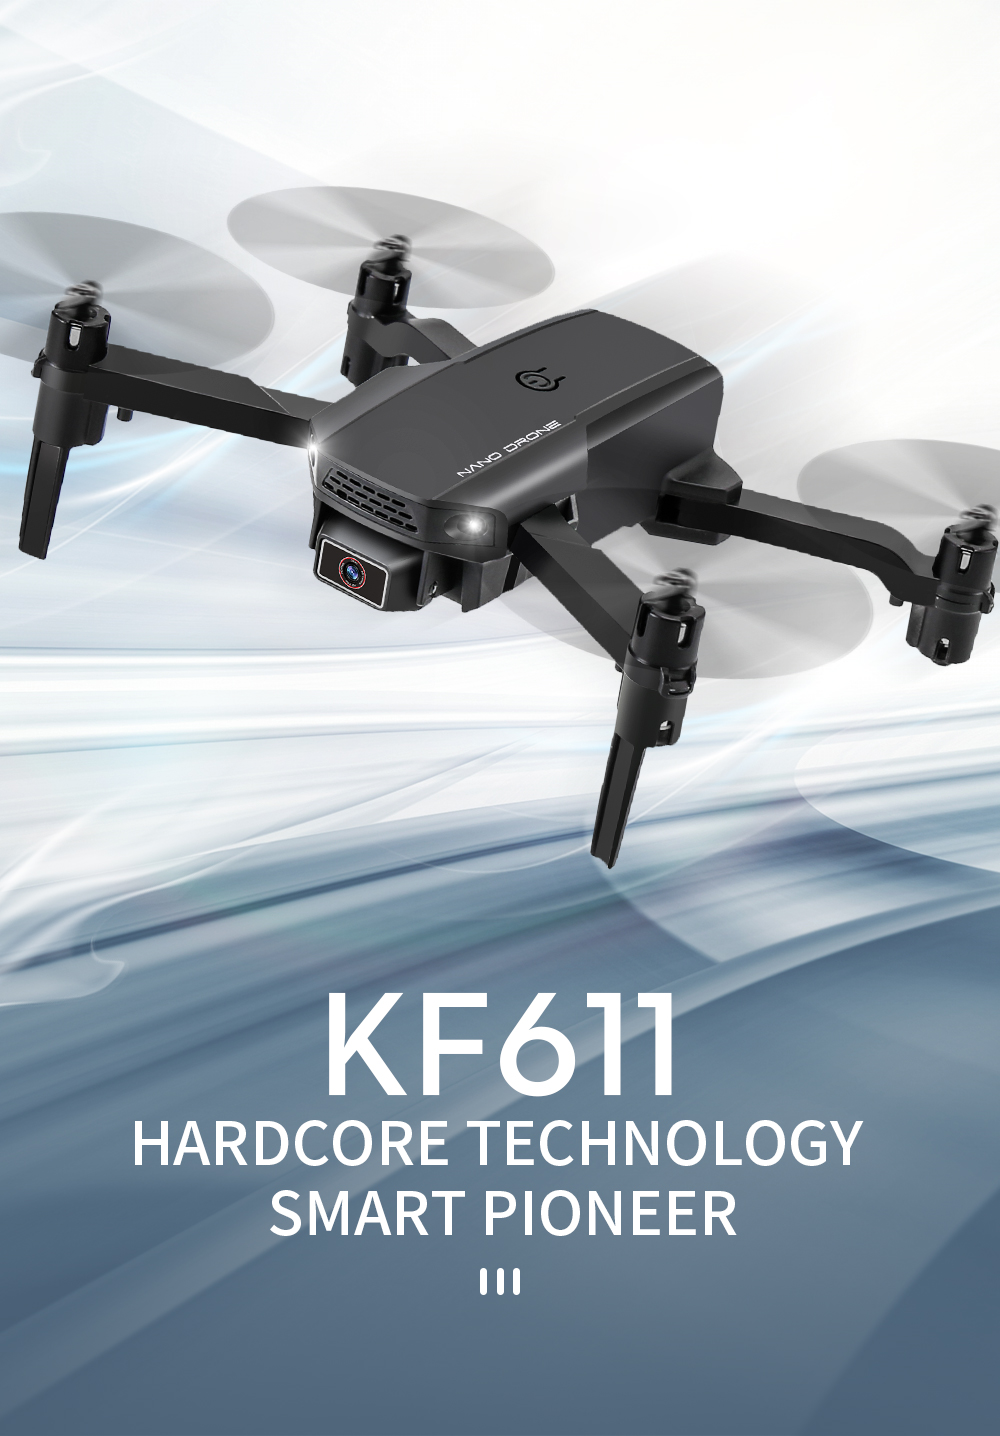 KF611-1_01